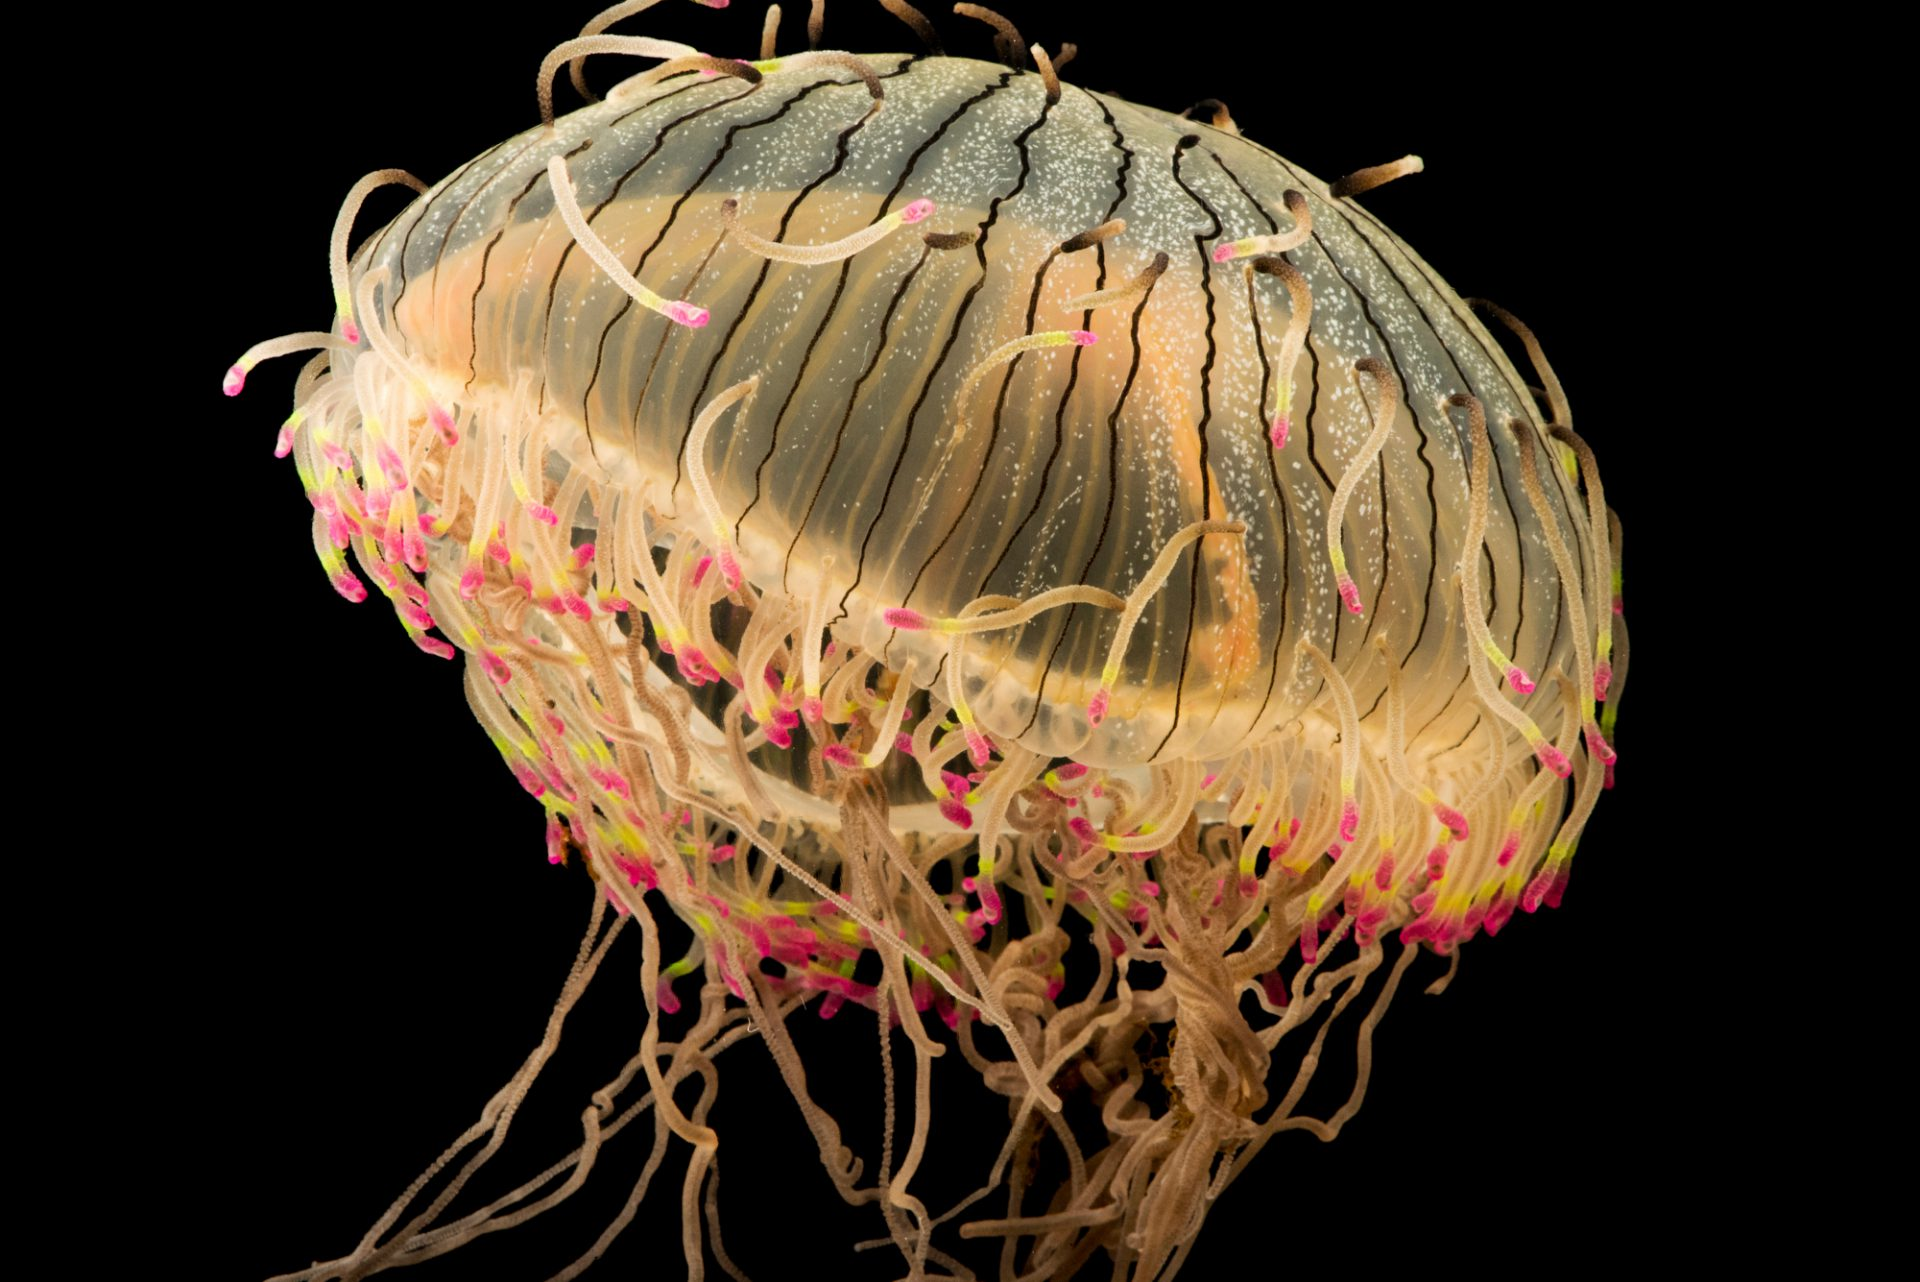 Photo: Flowerhat sea jelly (Olindias formosa) at Aquarium of the Pacific in Long Beach, CA.